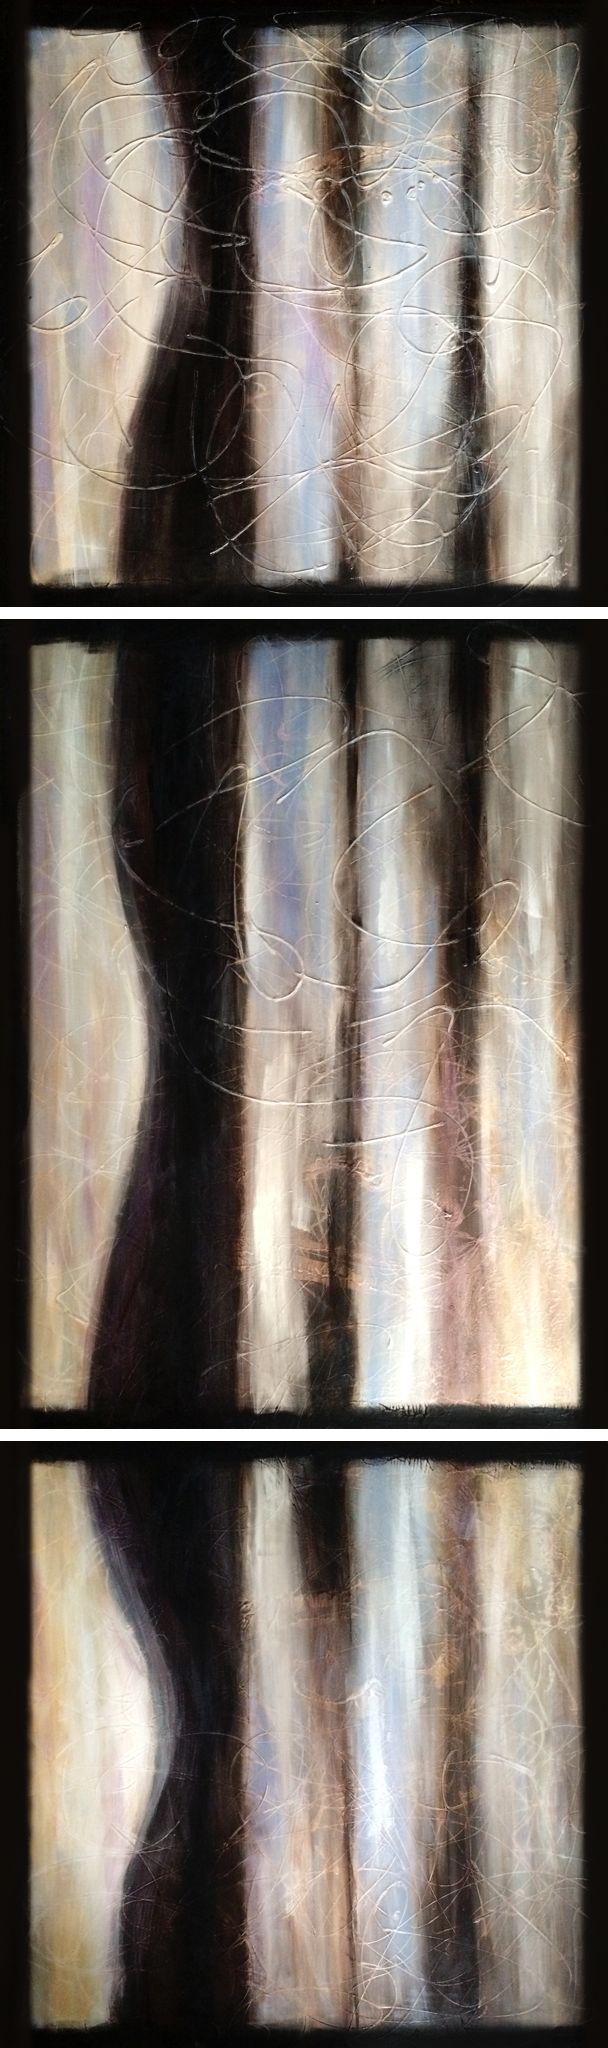 "Tranquility! by Jill English  | 36""w x 120""h | Original Art | http://www.vangoart.co/jillenglish/tranquility-3ff9b6c5-889e-4ae0-9d36-a3677ddbb5c6 @VangoArt"